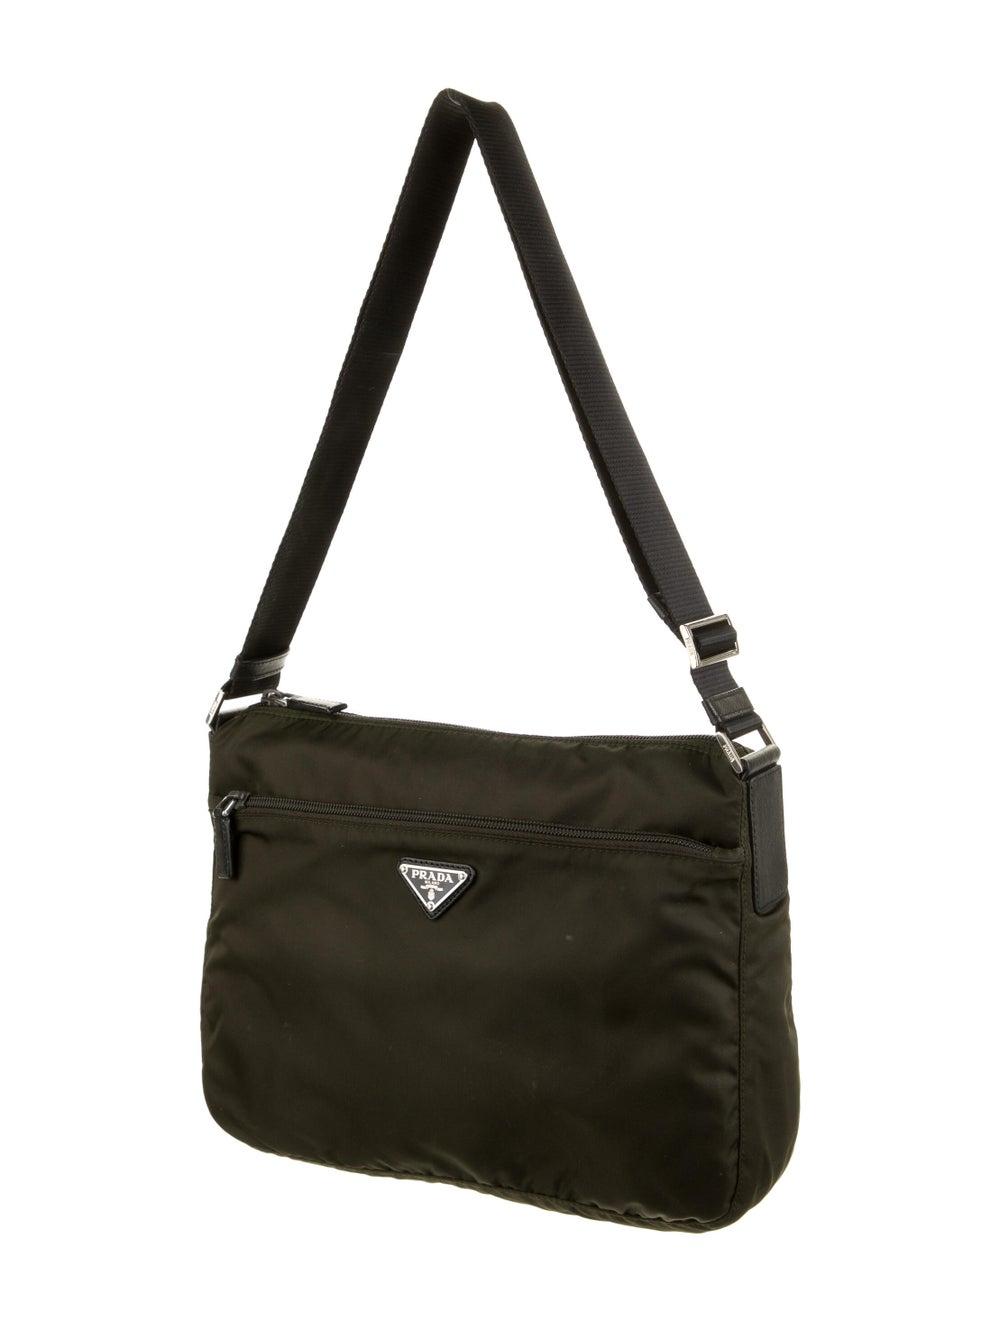 Prada Tessuto Messenger Bag Green - image 3